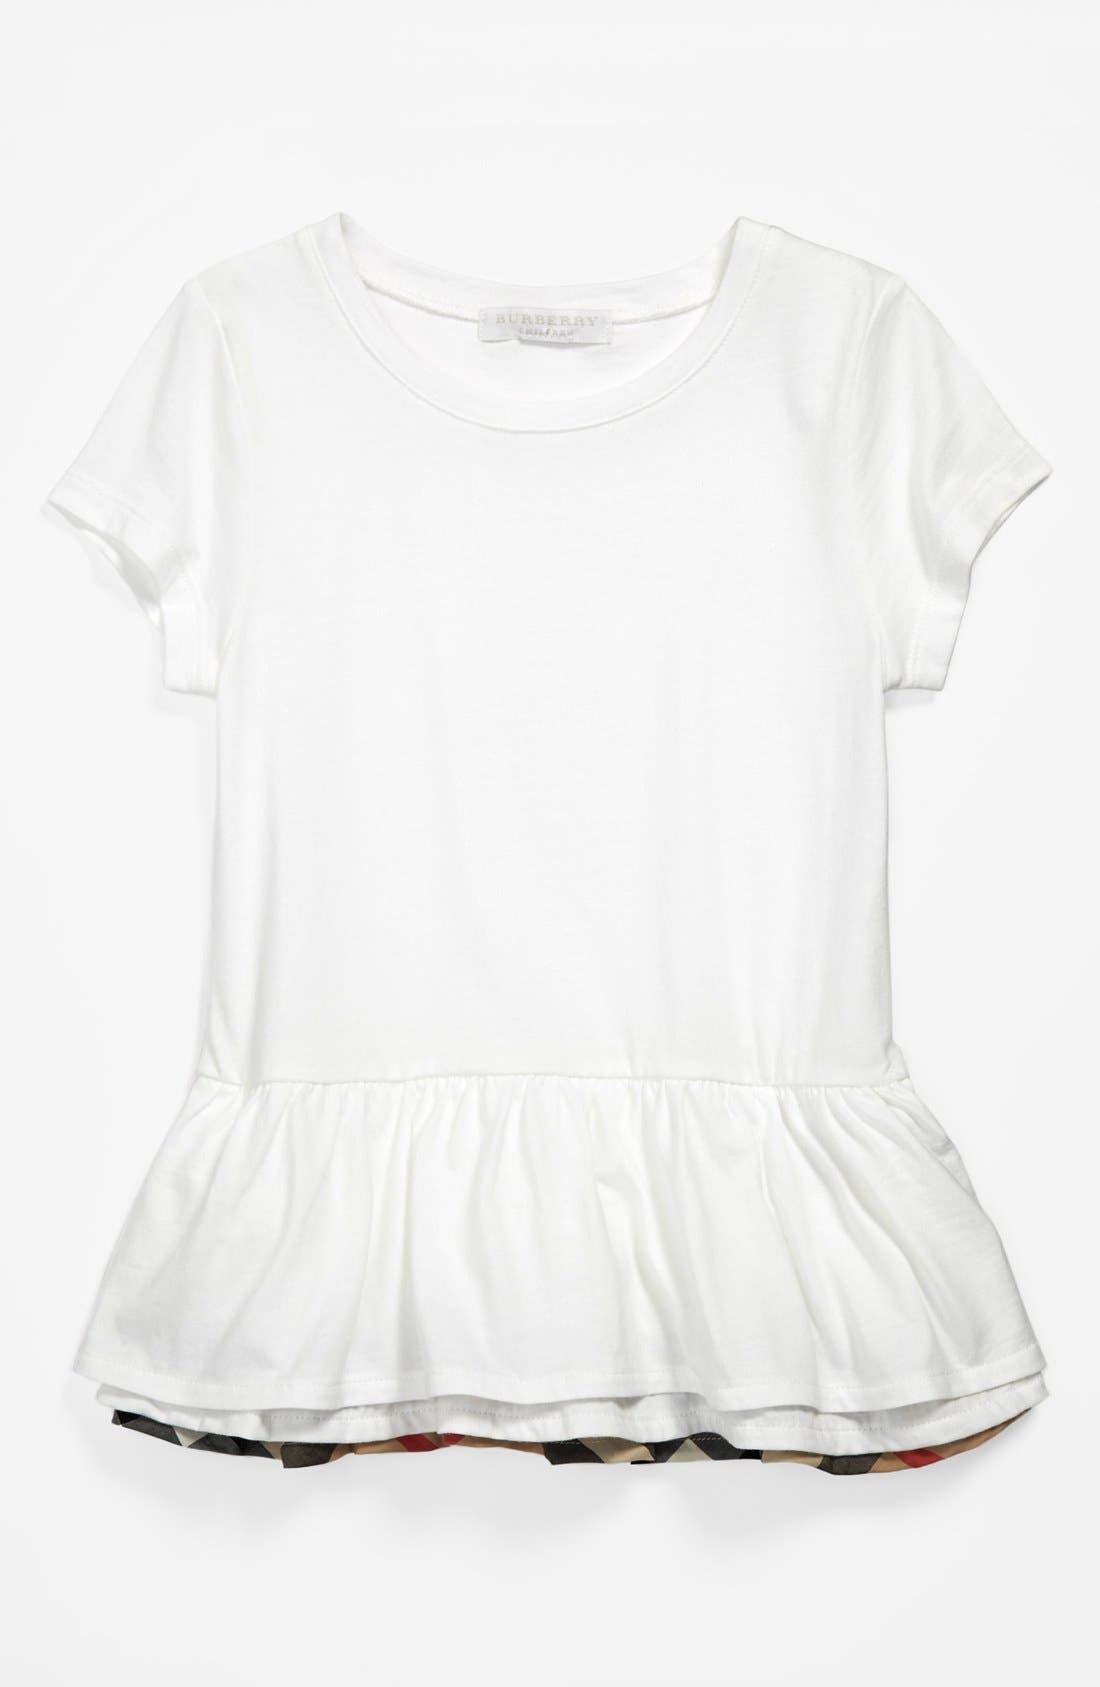 Alternate Image 1 Selected - Burberry 'Tyna' Tiered Ruffle Hem Top (Little Girls & Big Girls)